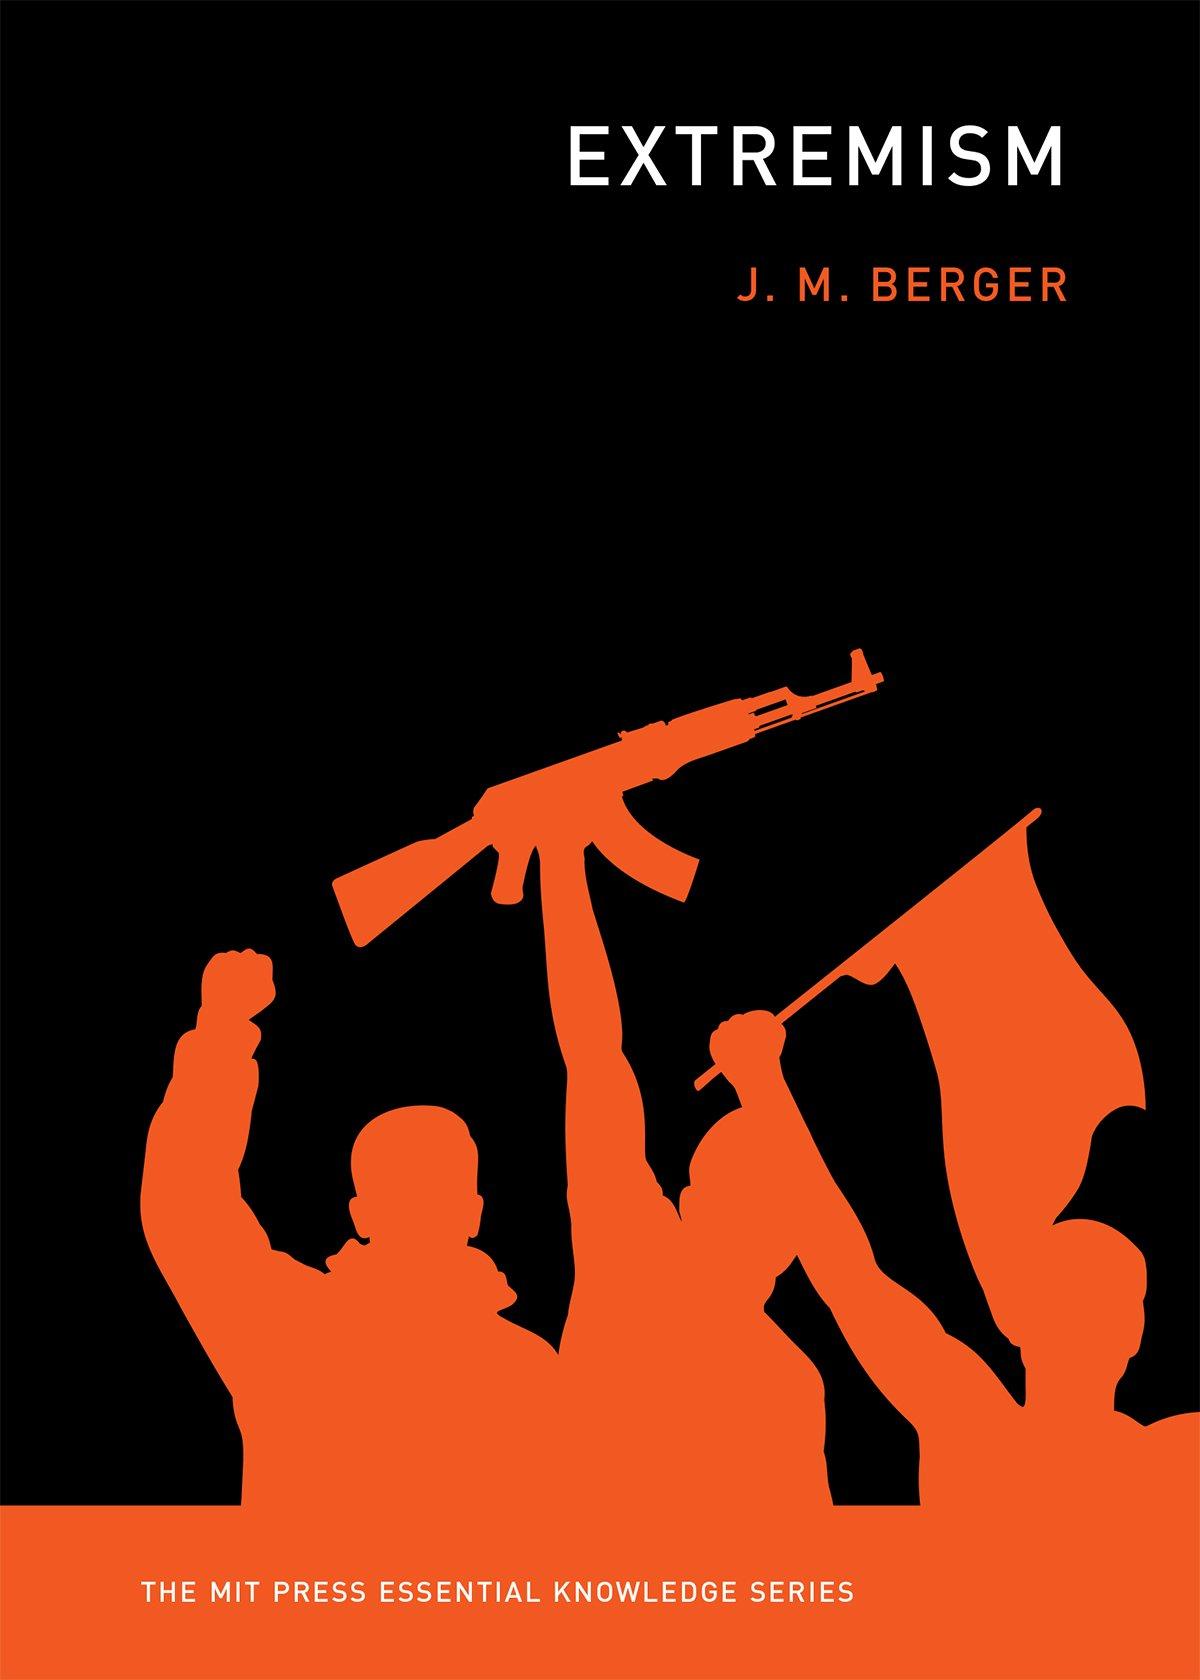 Extremism  The MIT Press Essential Knowledge Series